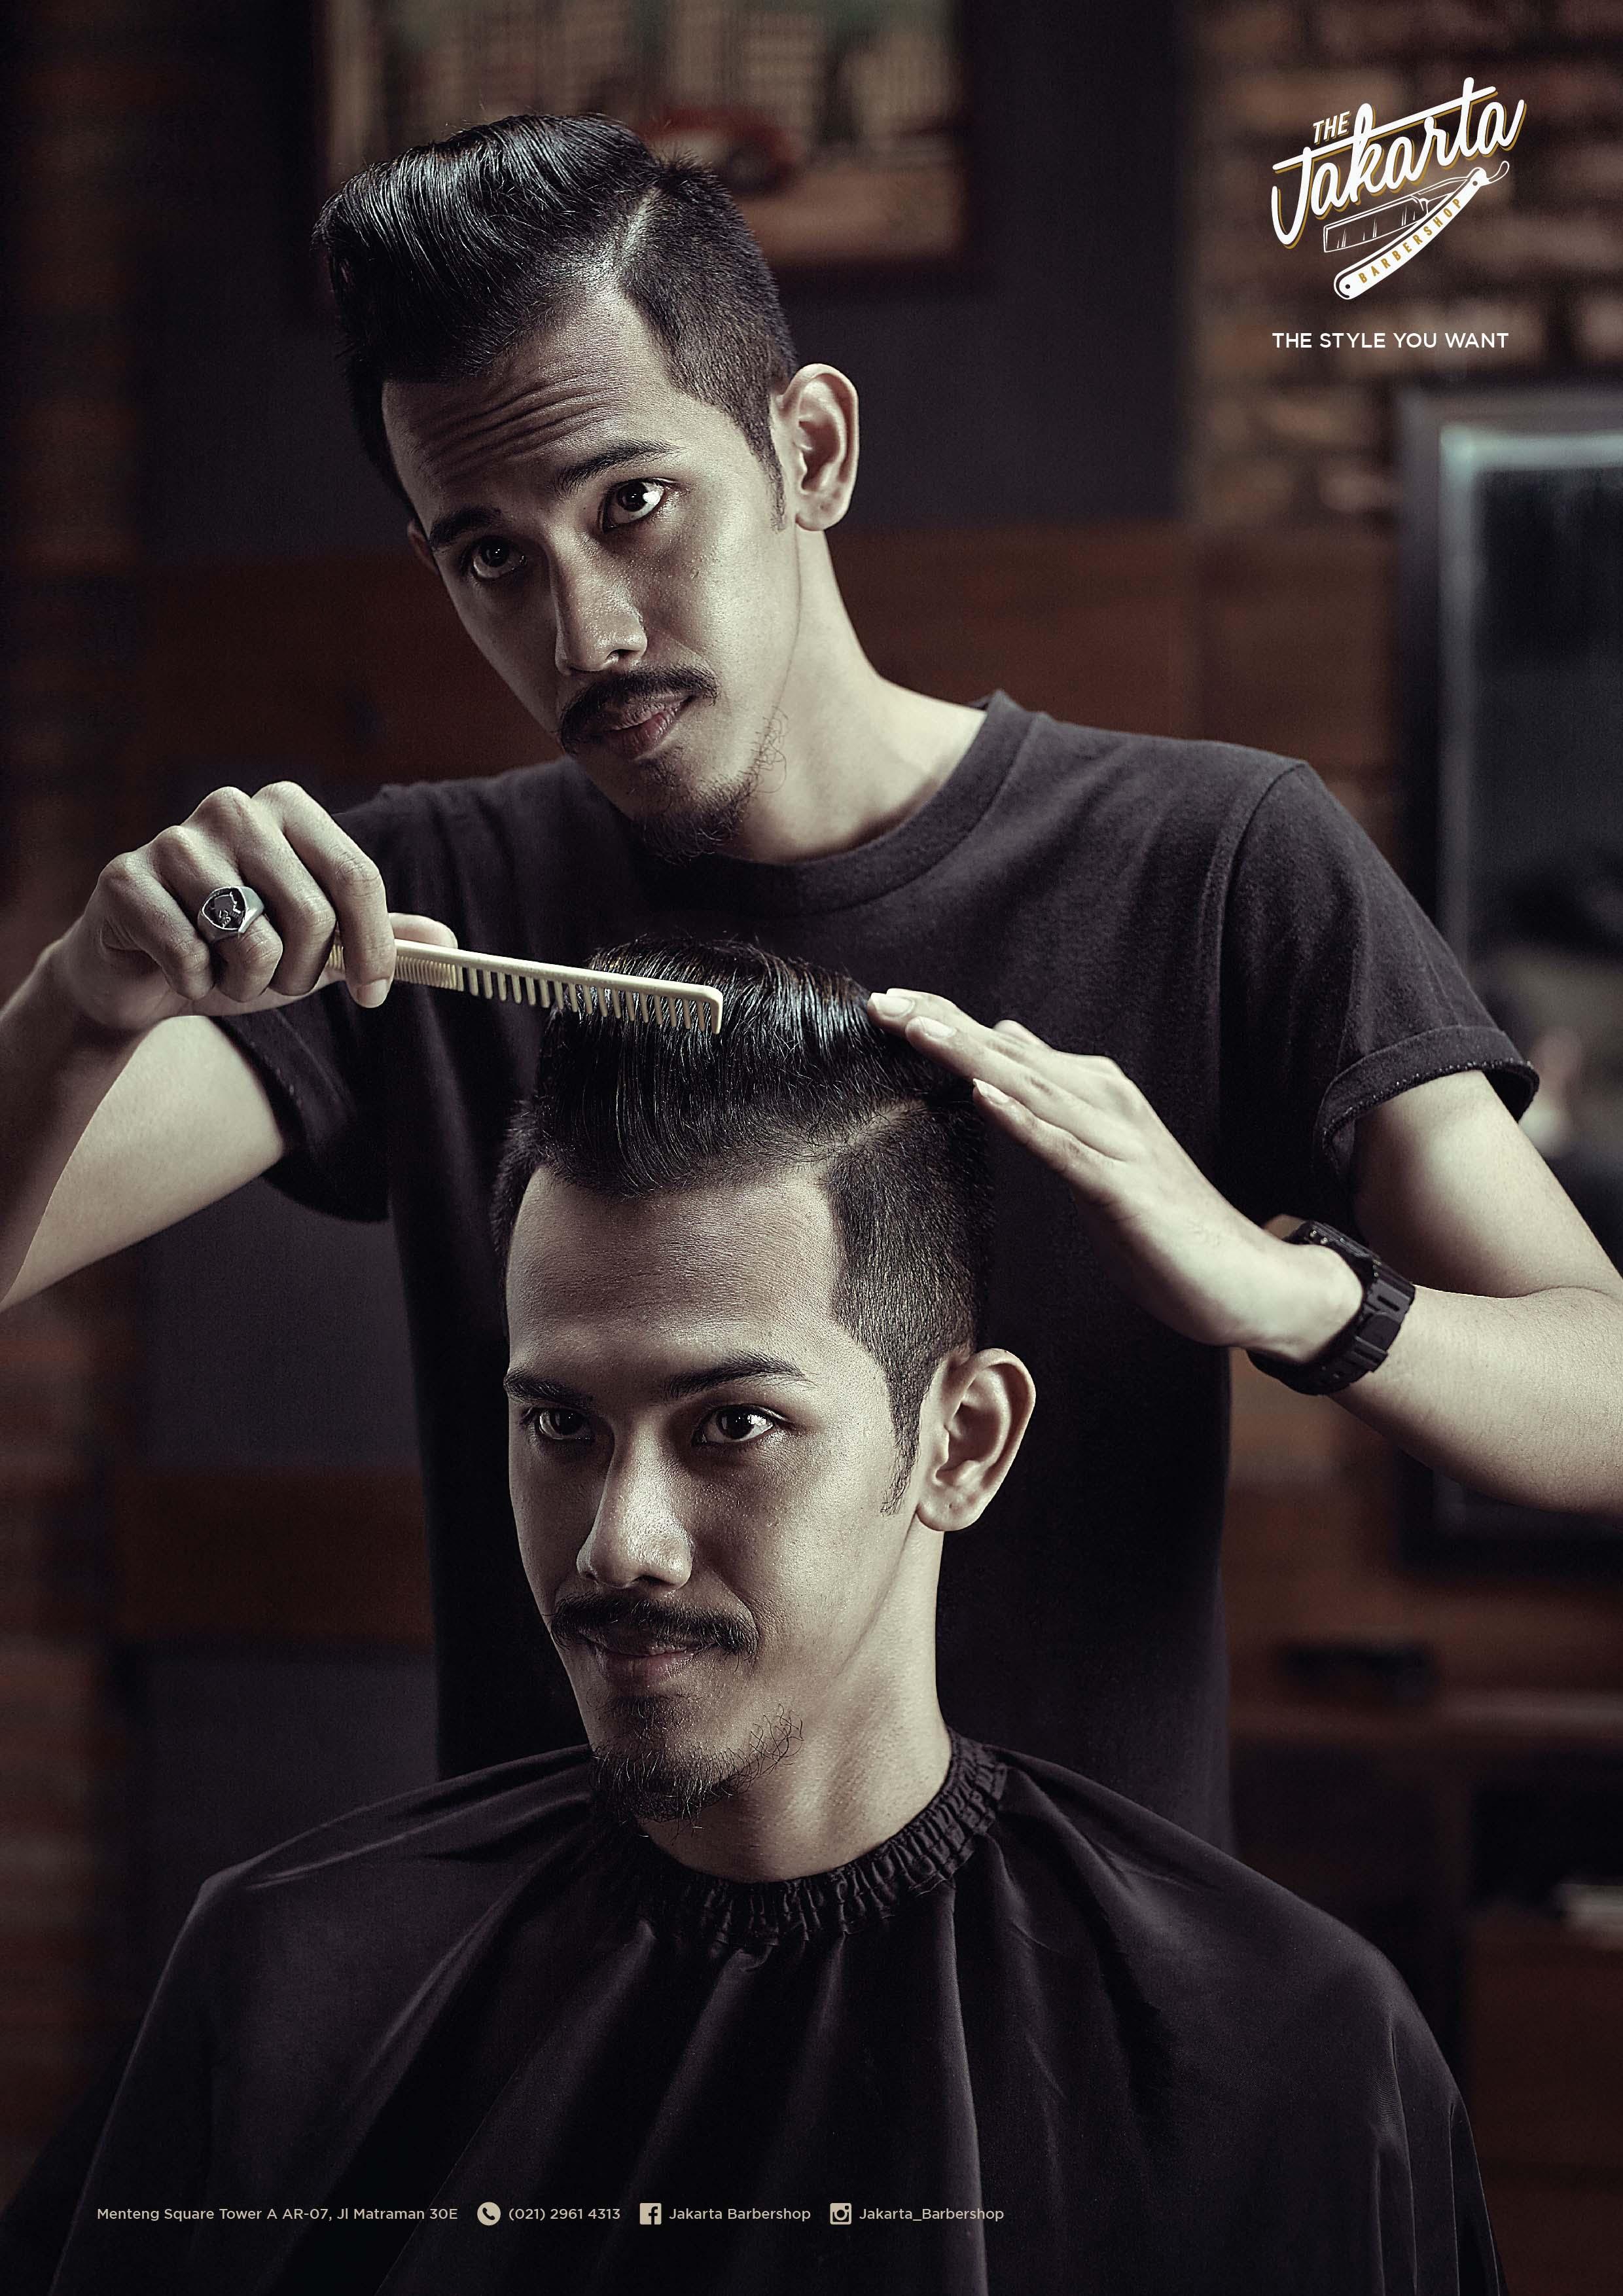 Print Ad Jakarta Barbershop Rockabilly - Hairstyle barbershop indonesia